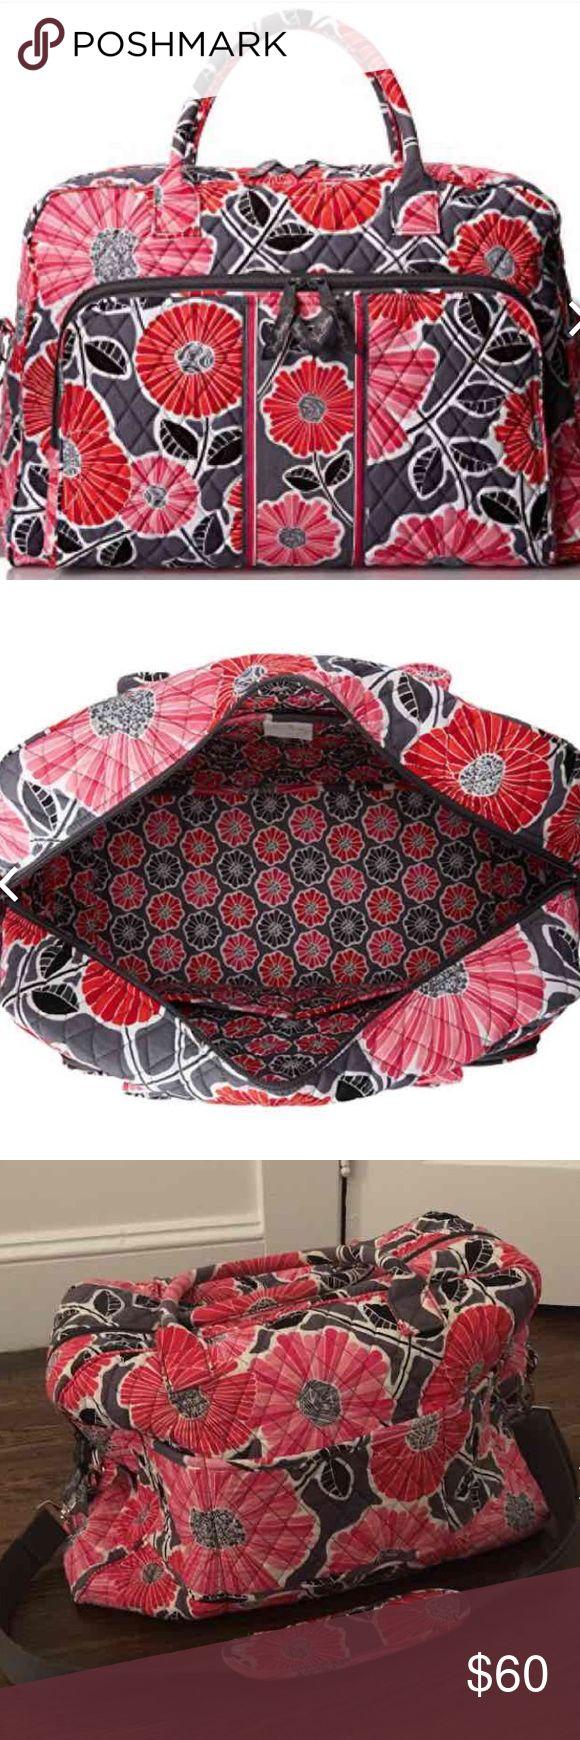 "Vera Bradley Koffer Vera Bradley Koffer. Muster heißt ""Kirschblüte"" …."